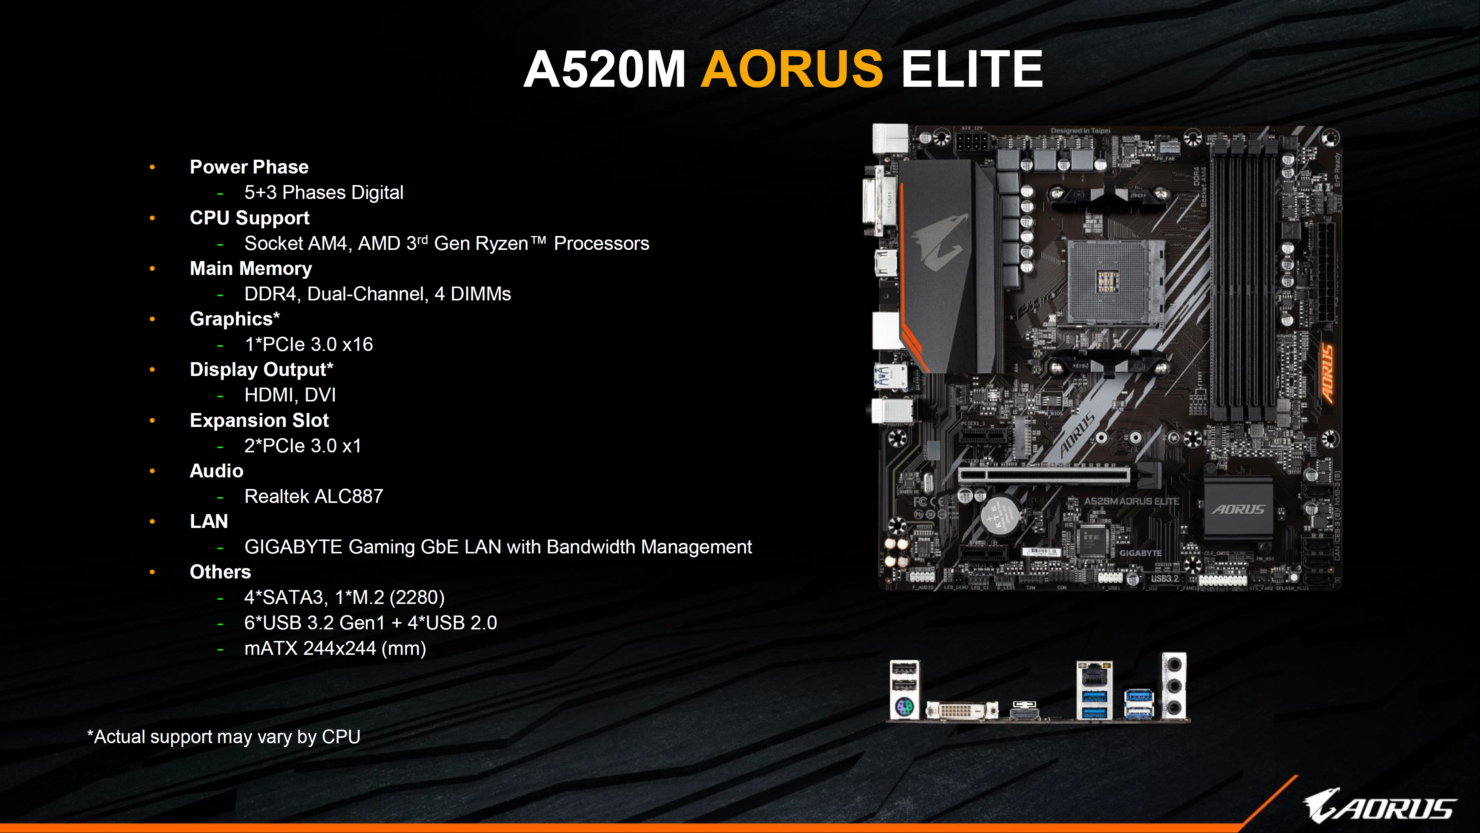 a520m-aorus-elite-motherboard